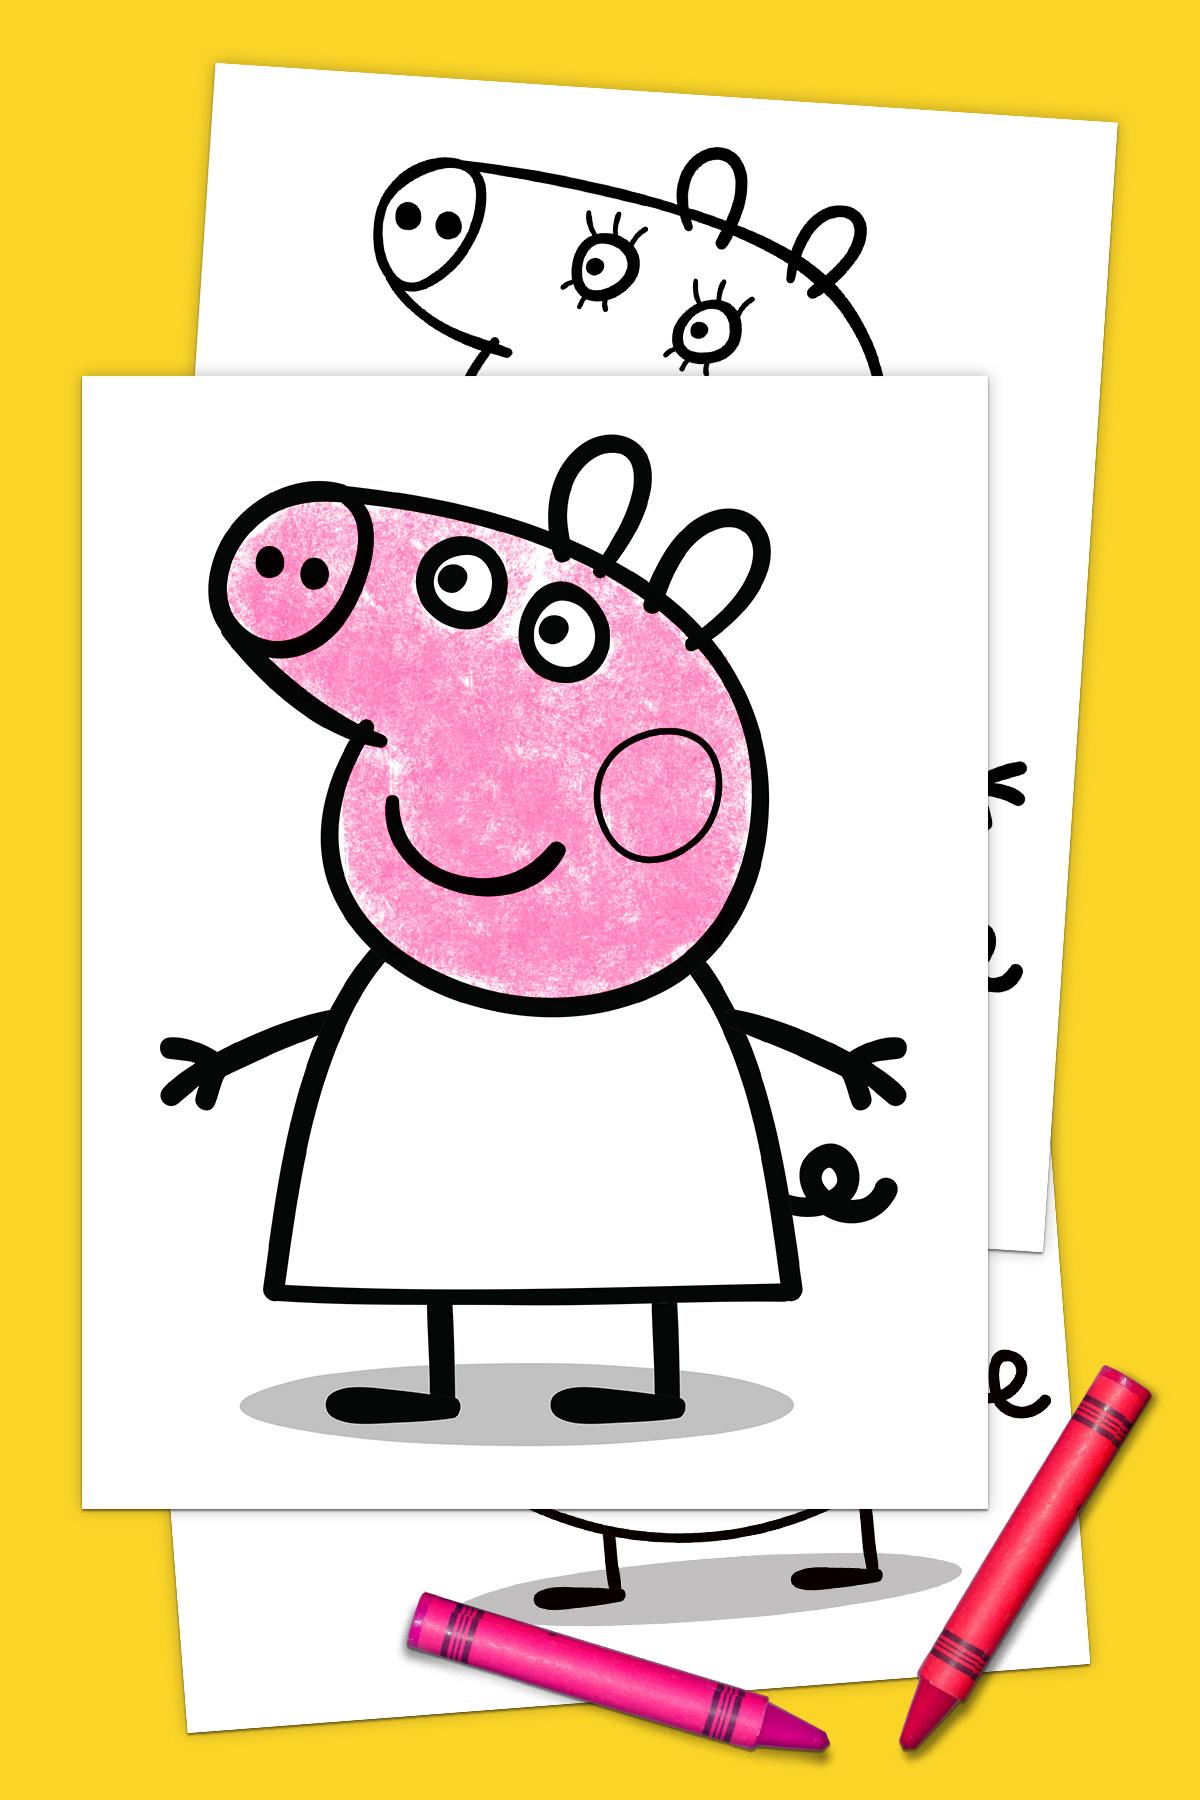 Peppa Pig Coloring Pack Nickelodeon Parents